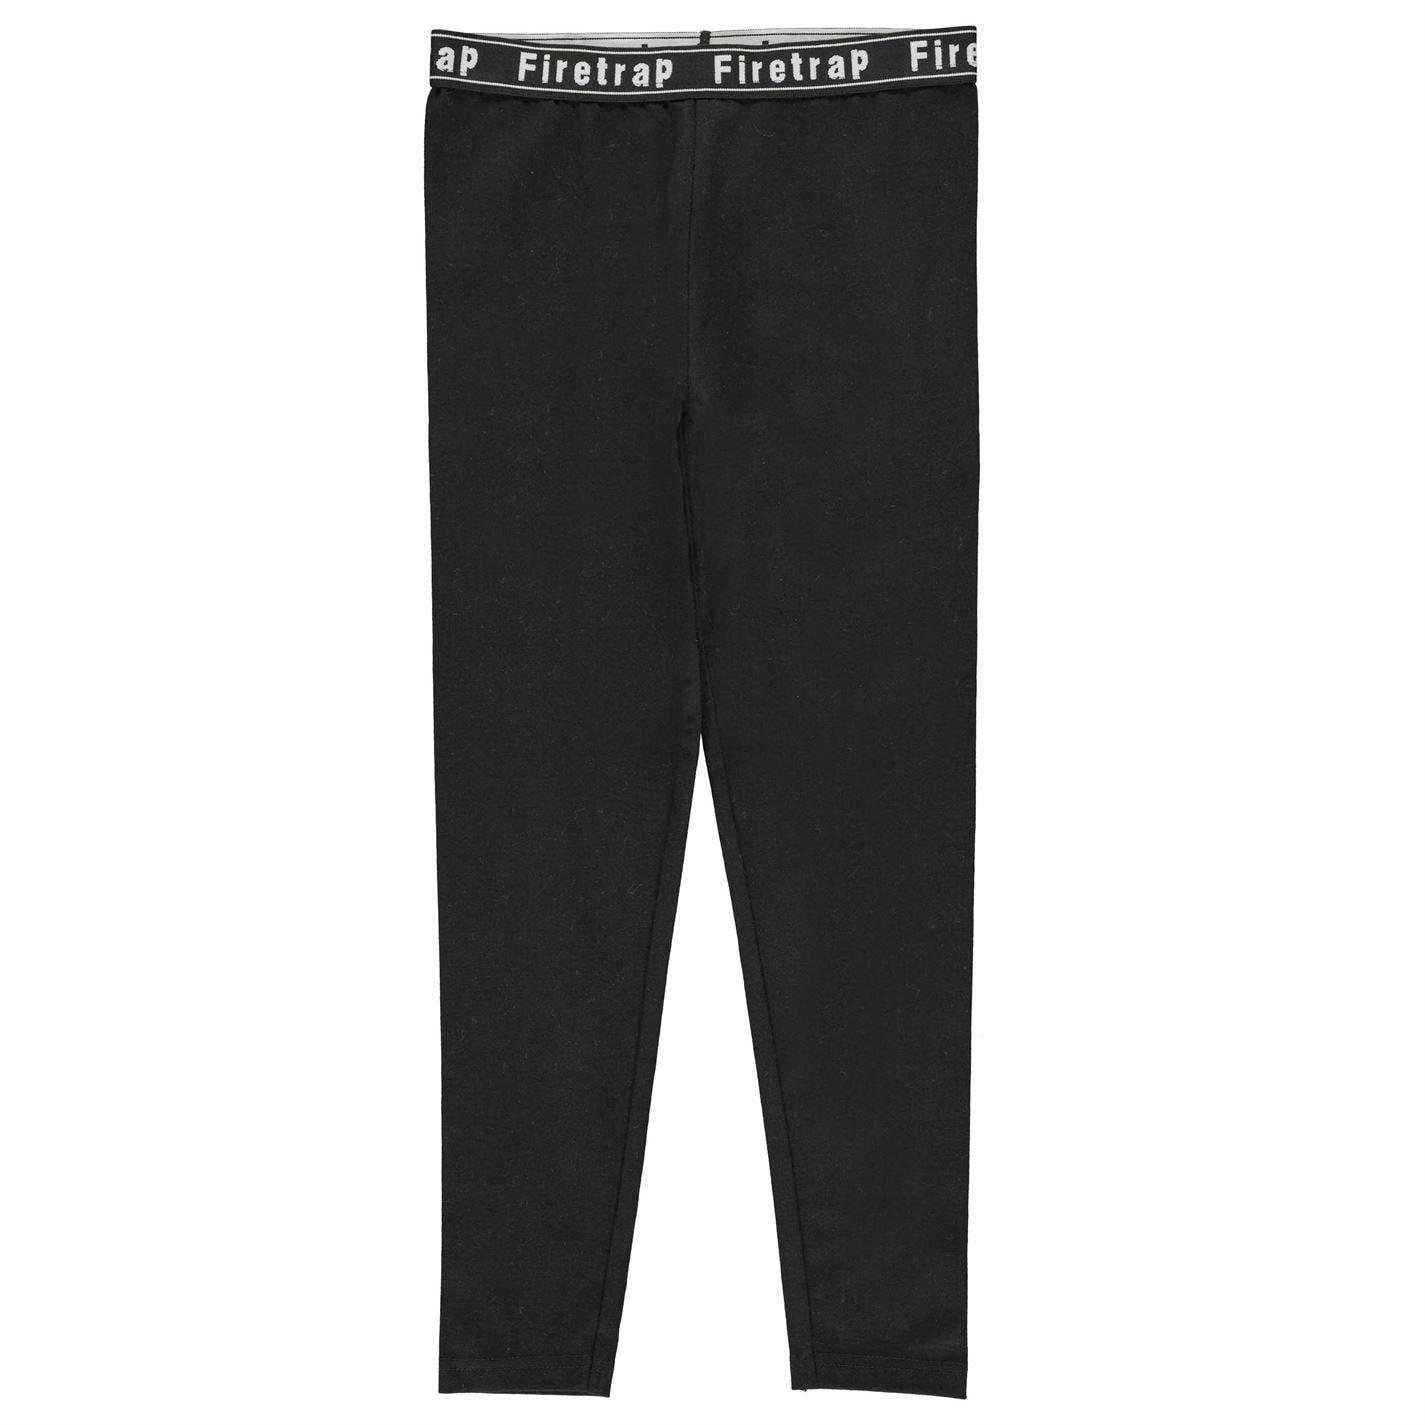 Firetrap Girls Leggings Trousers Pants Bottoms Junior